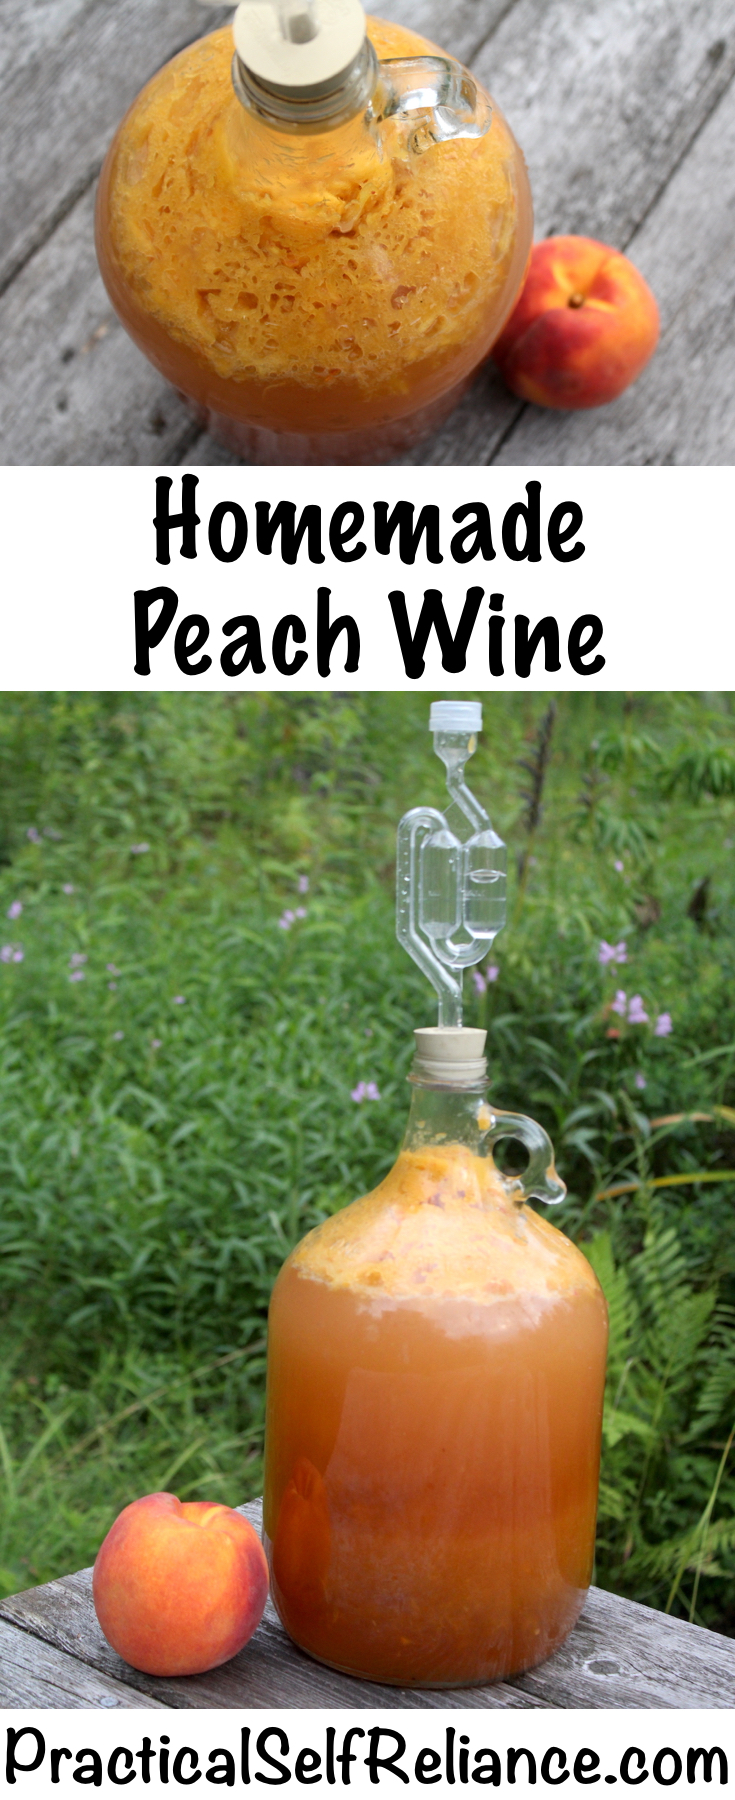 Homemade Peach Wine Recipe